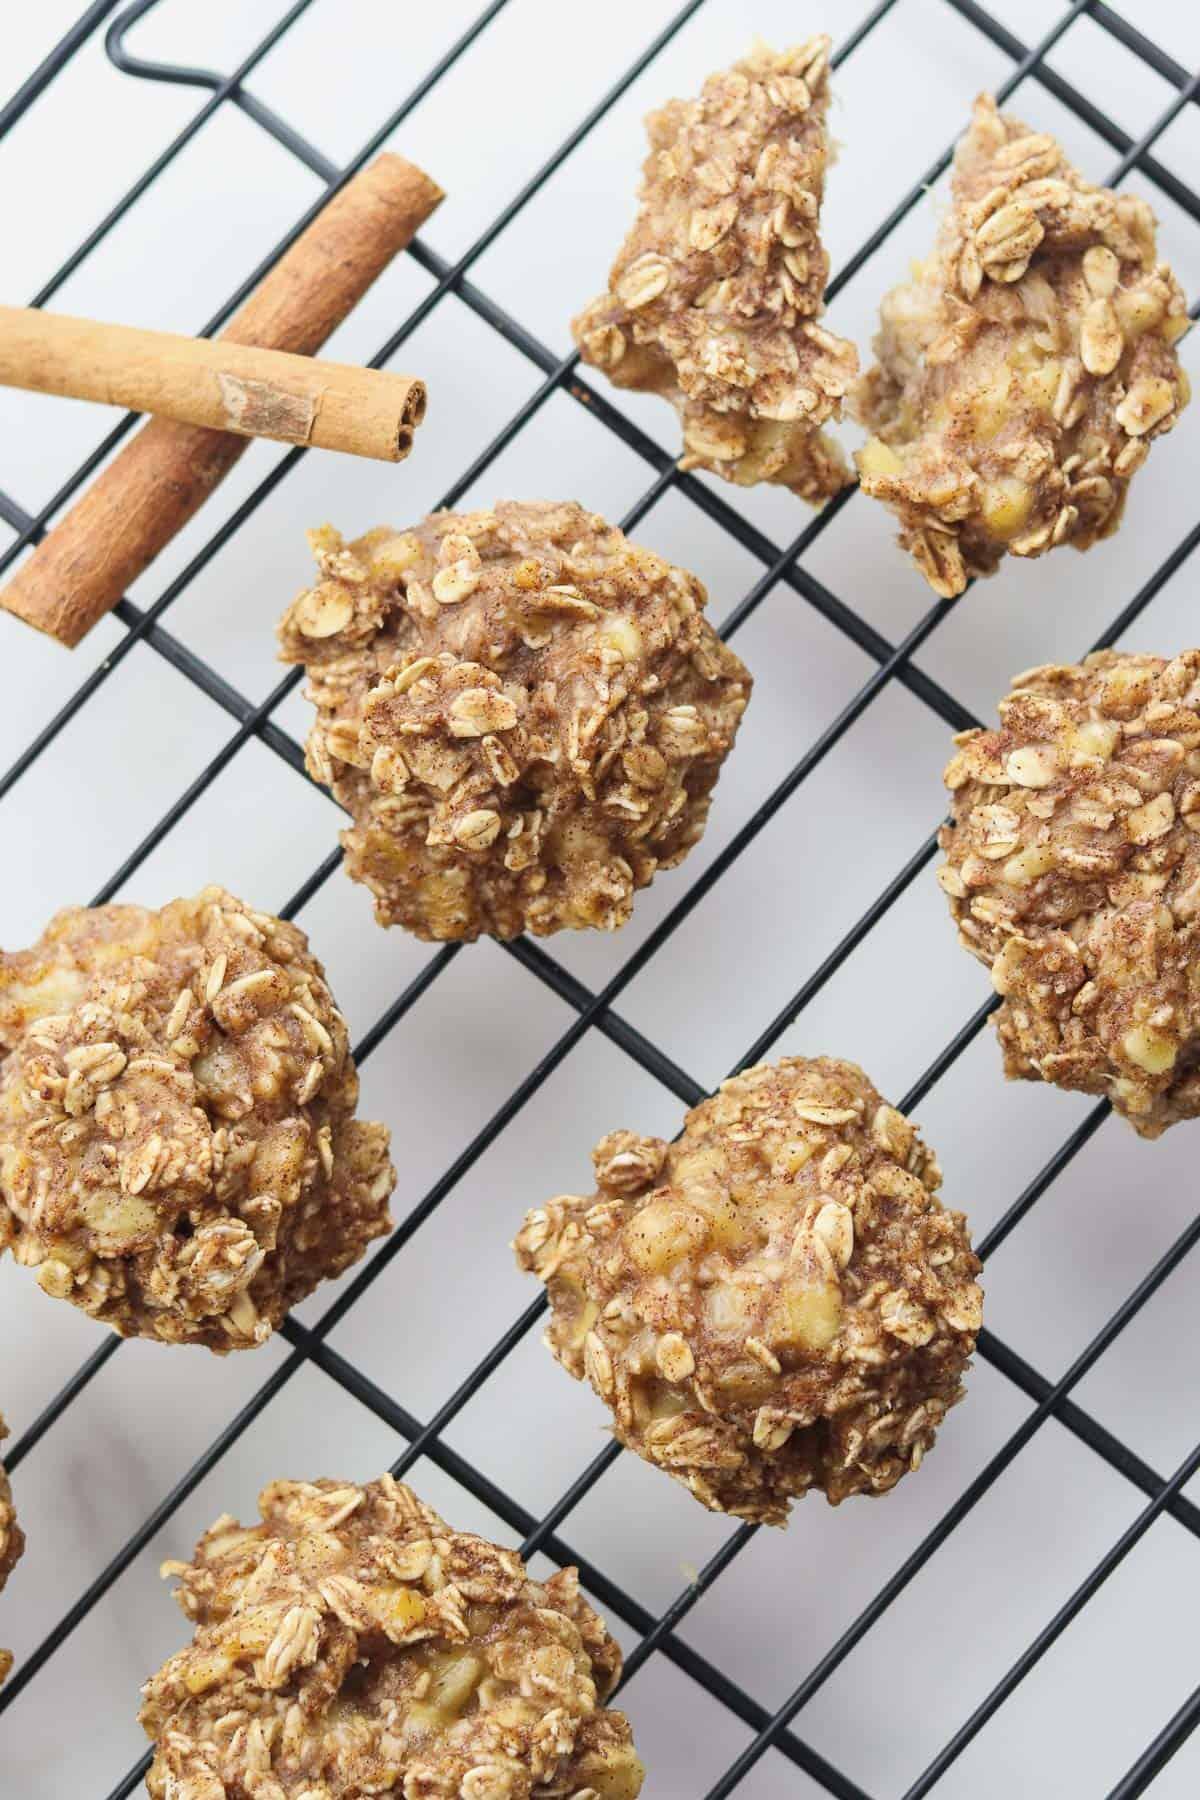 banana oat cookies on cooling rack with cinnamon sticks